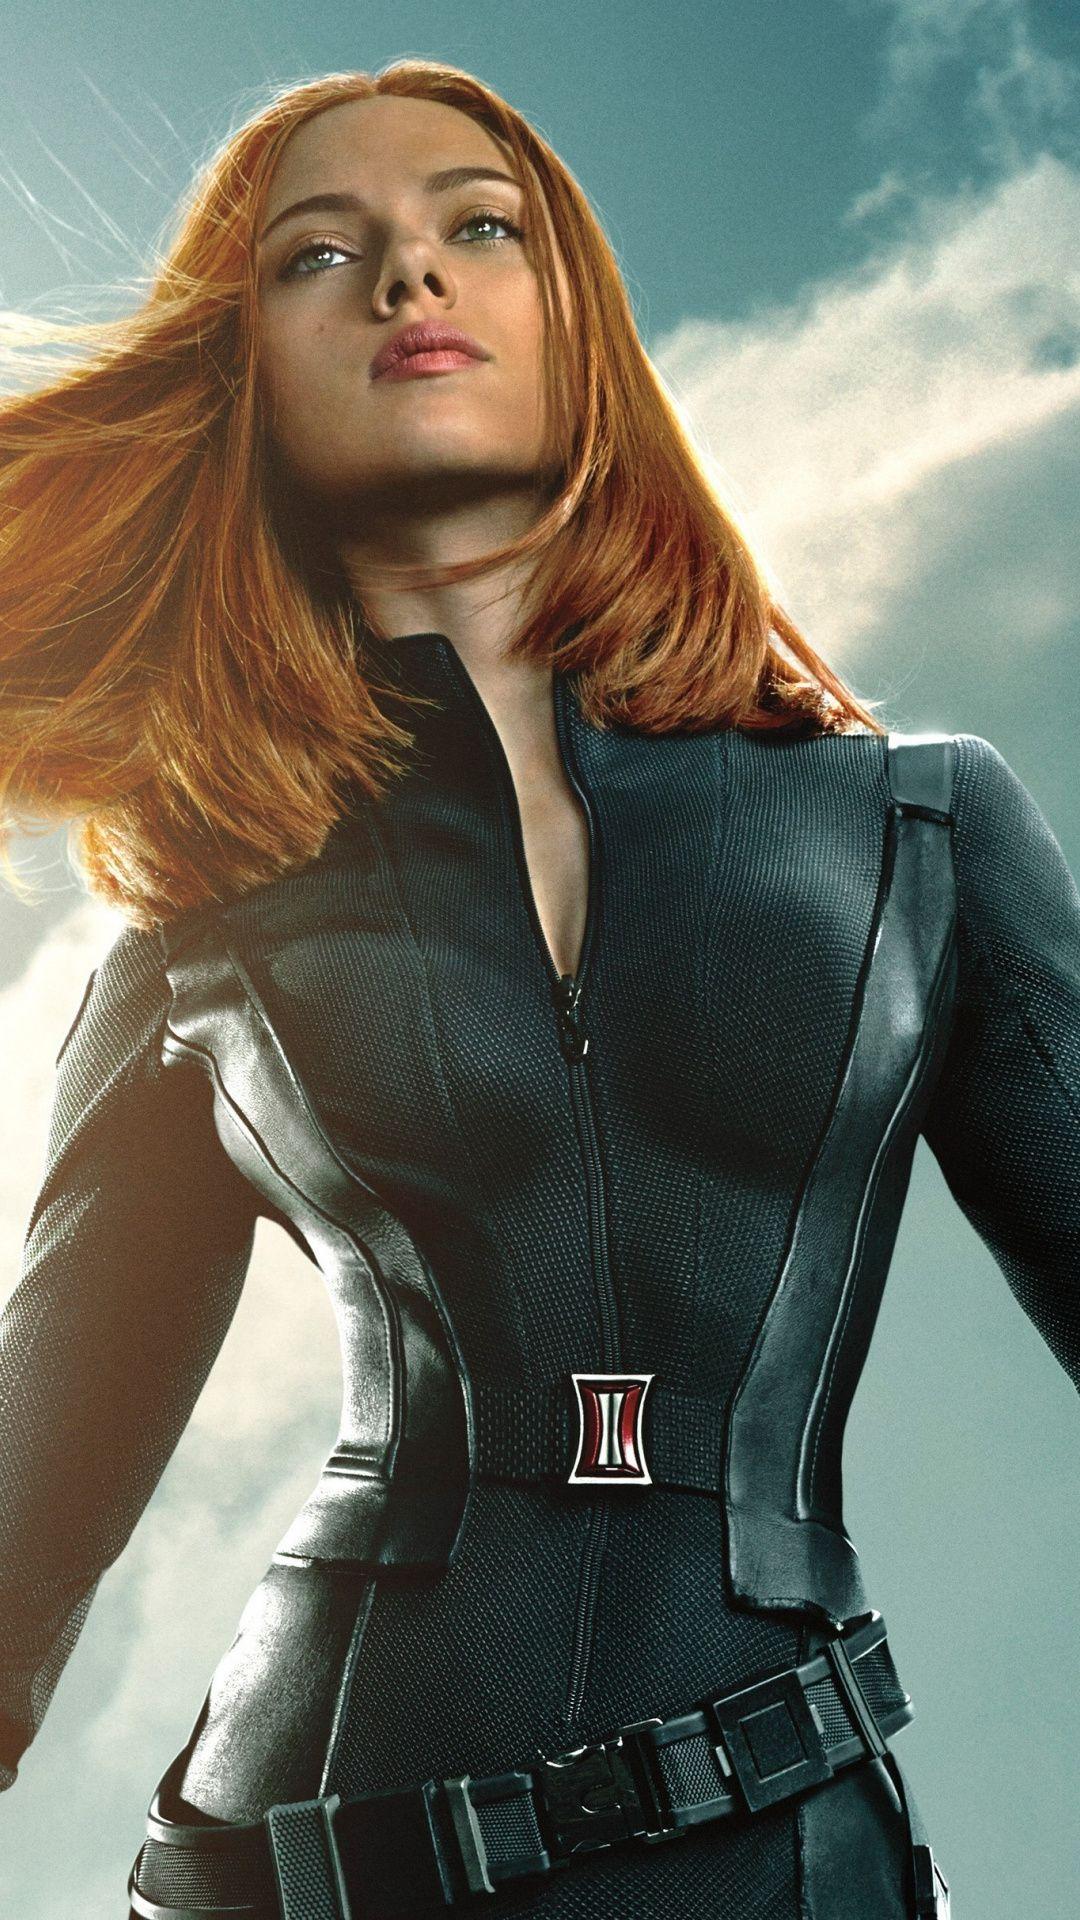 Black widow movie Scarlett Johansson 1080x1920 wallpaper 1080x1920